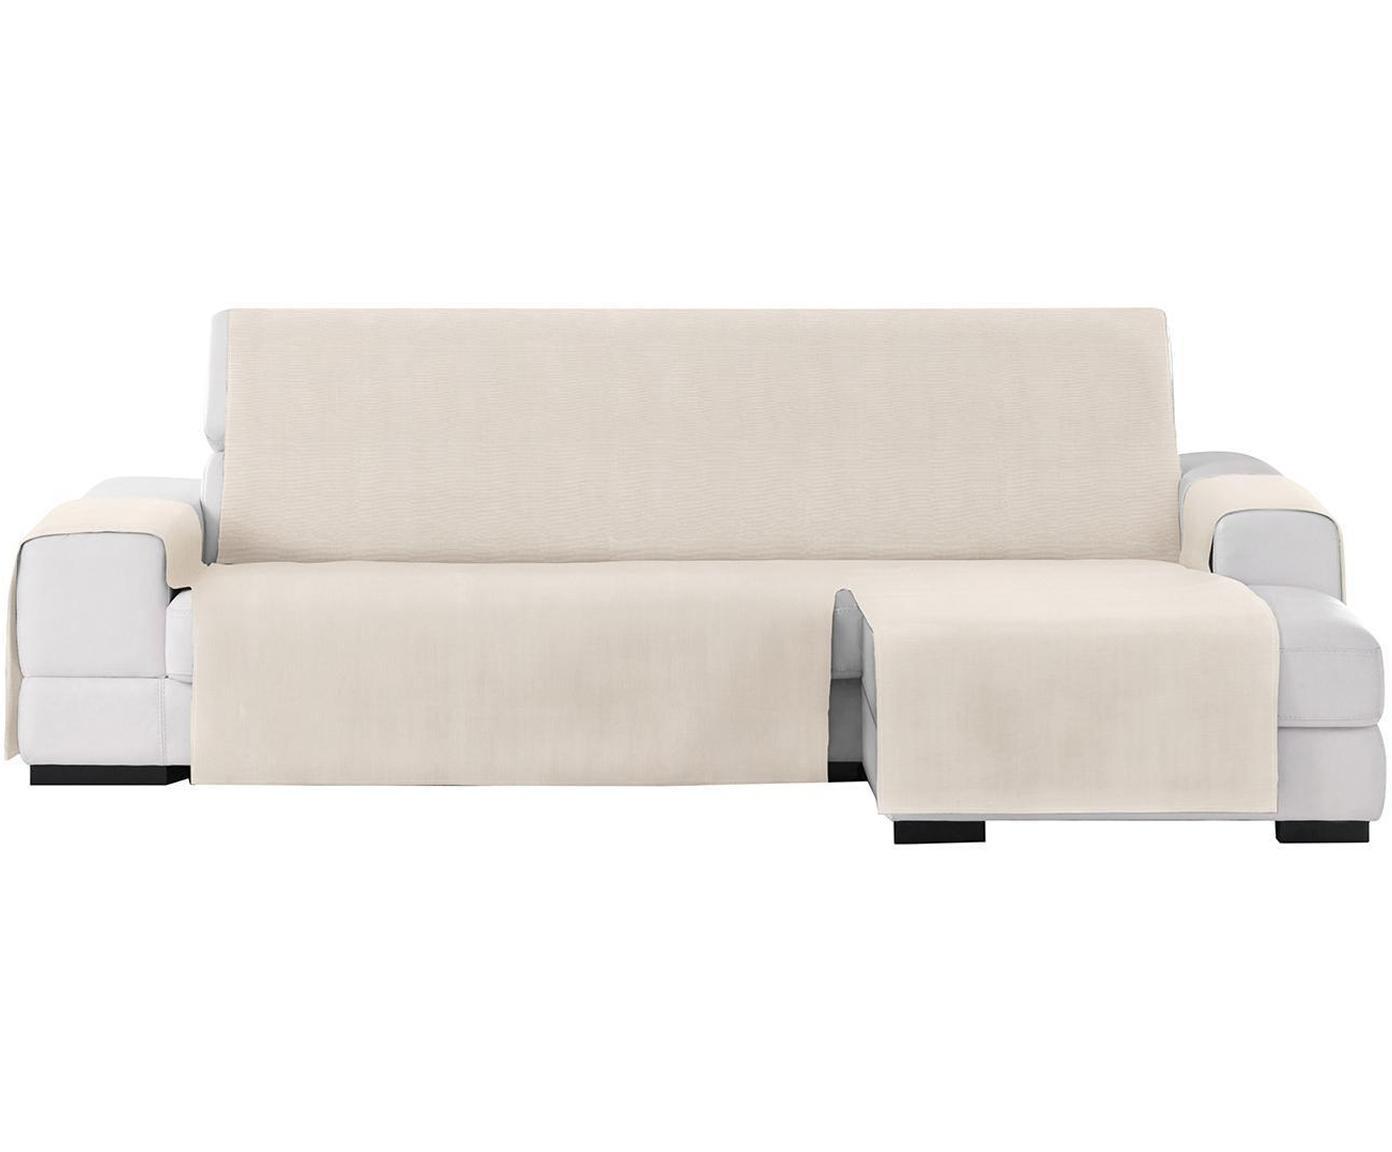 Funda de sofá Levante, 50%algodón, 50%poliéster, Beige, Brazo corto (240 cm)